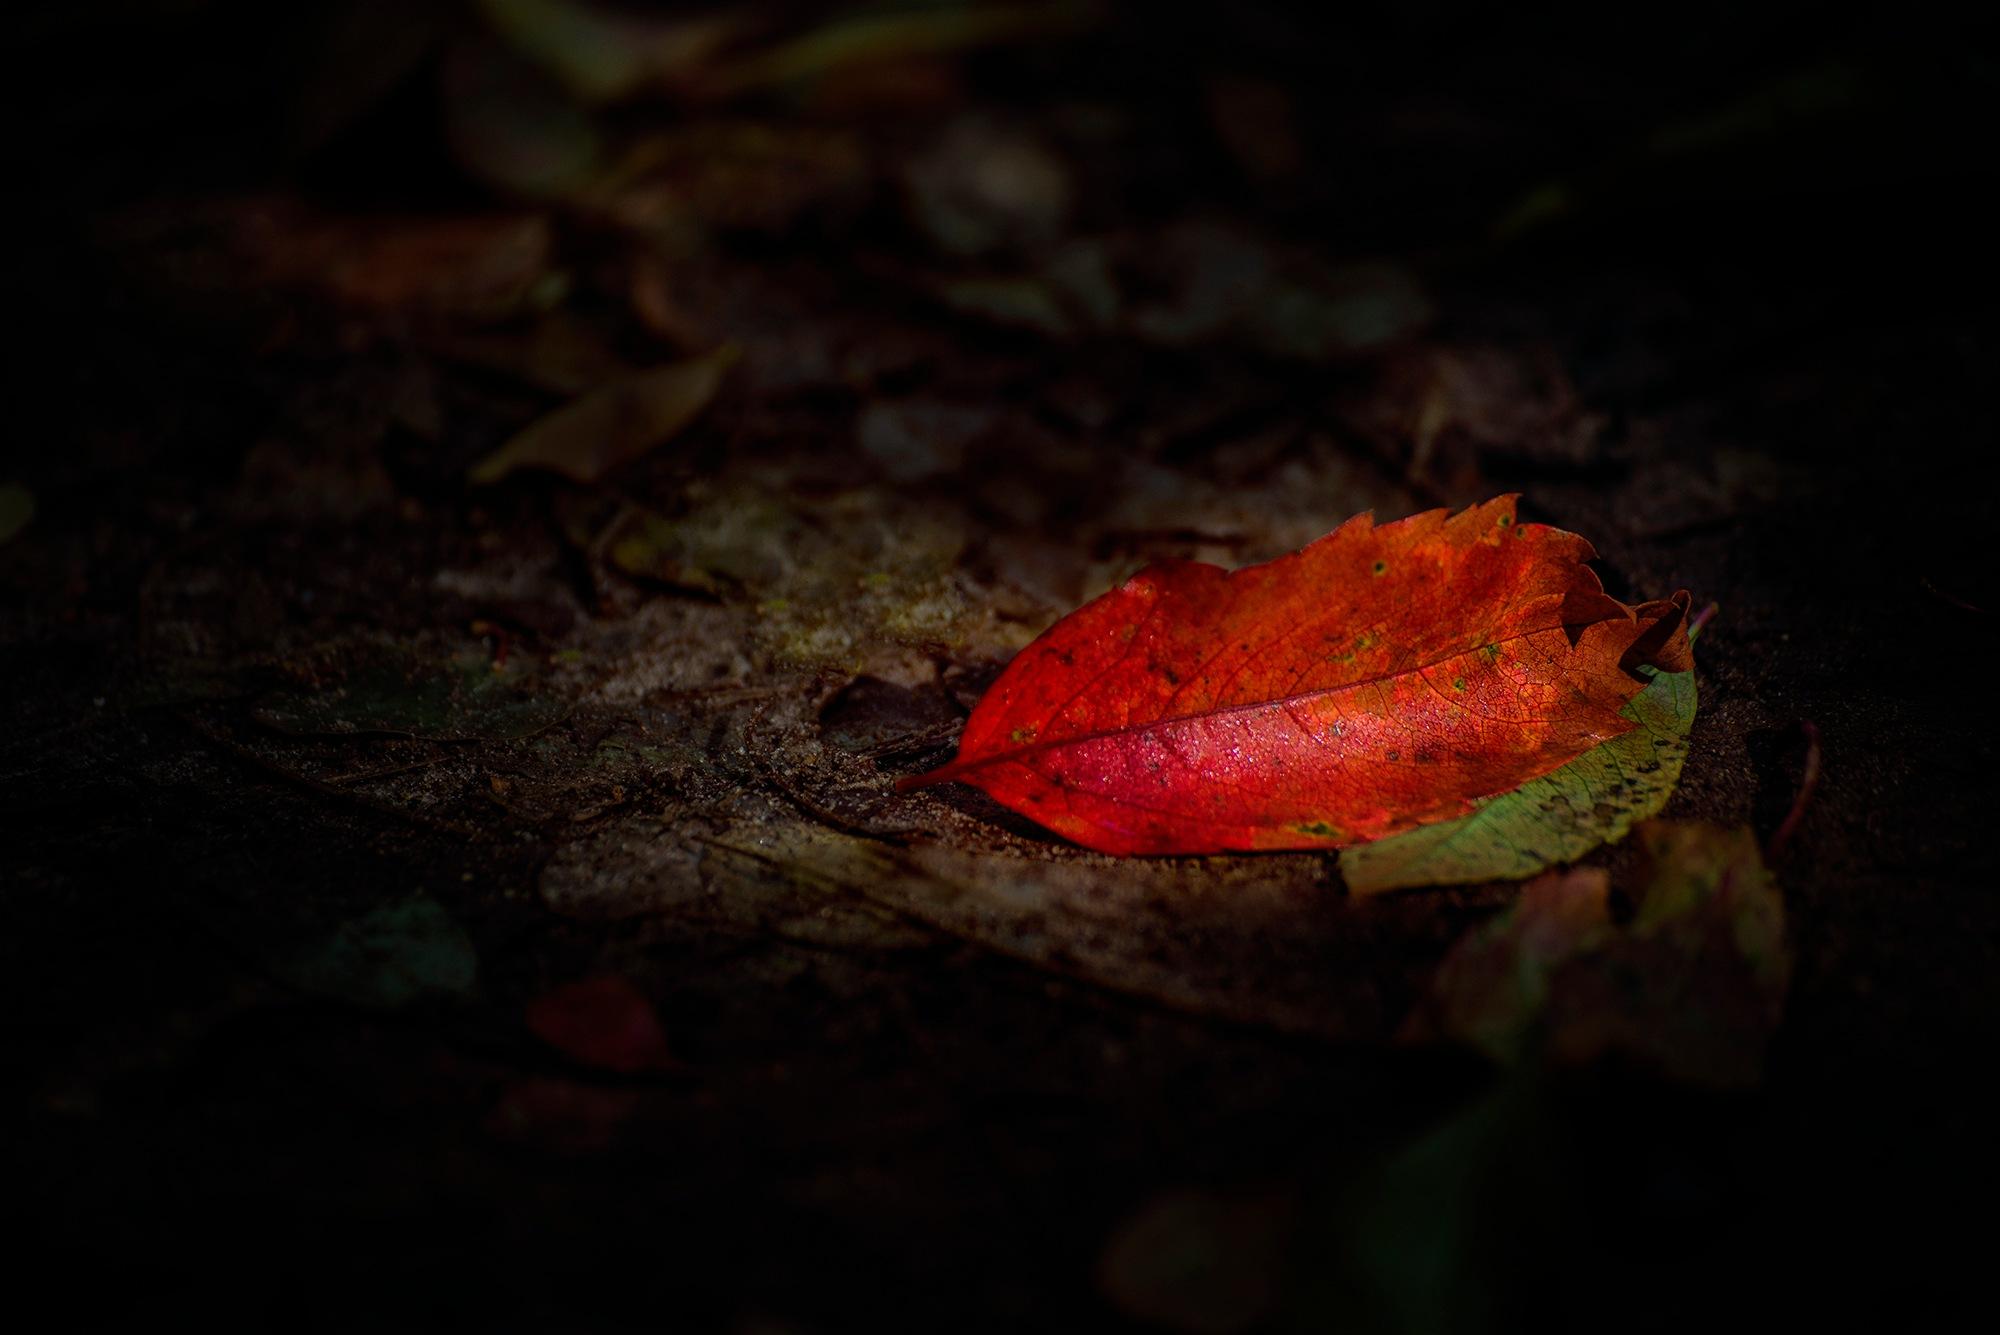 autumn by BeatrixBagdiCompositionartist